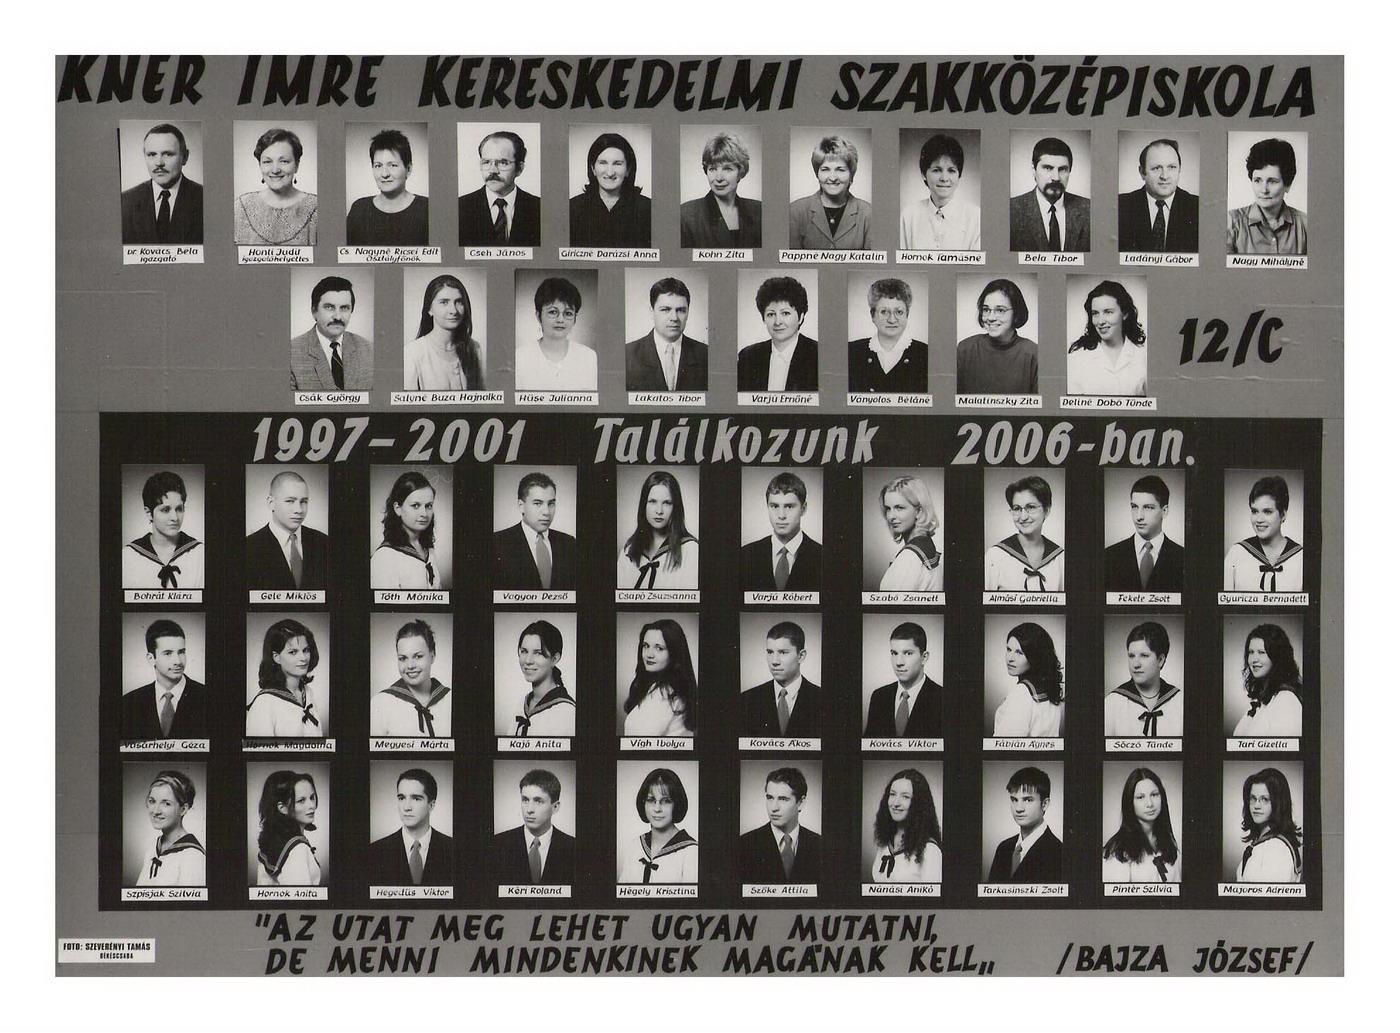 2001 12/C